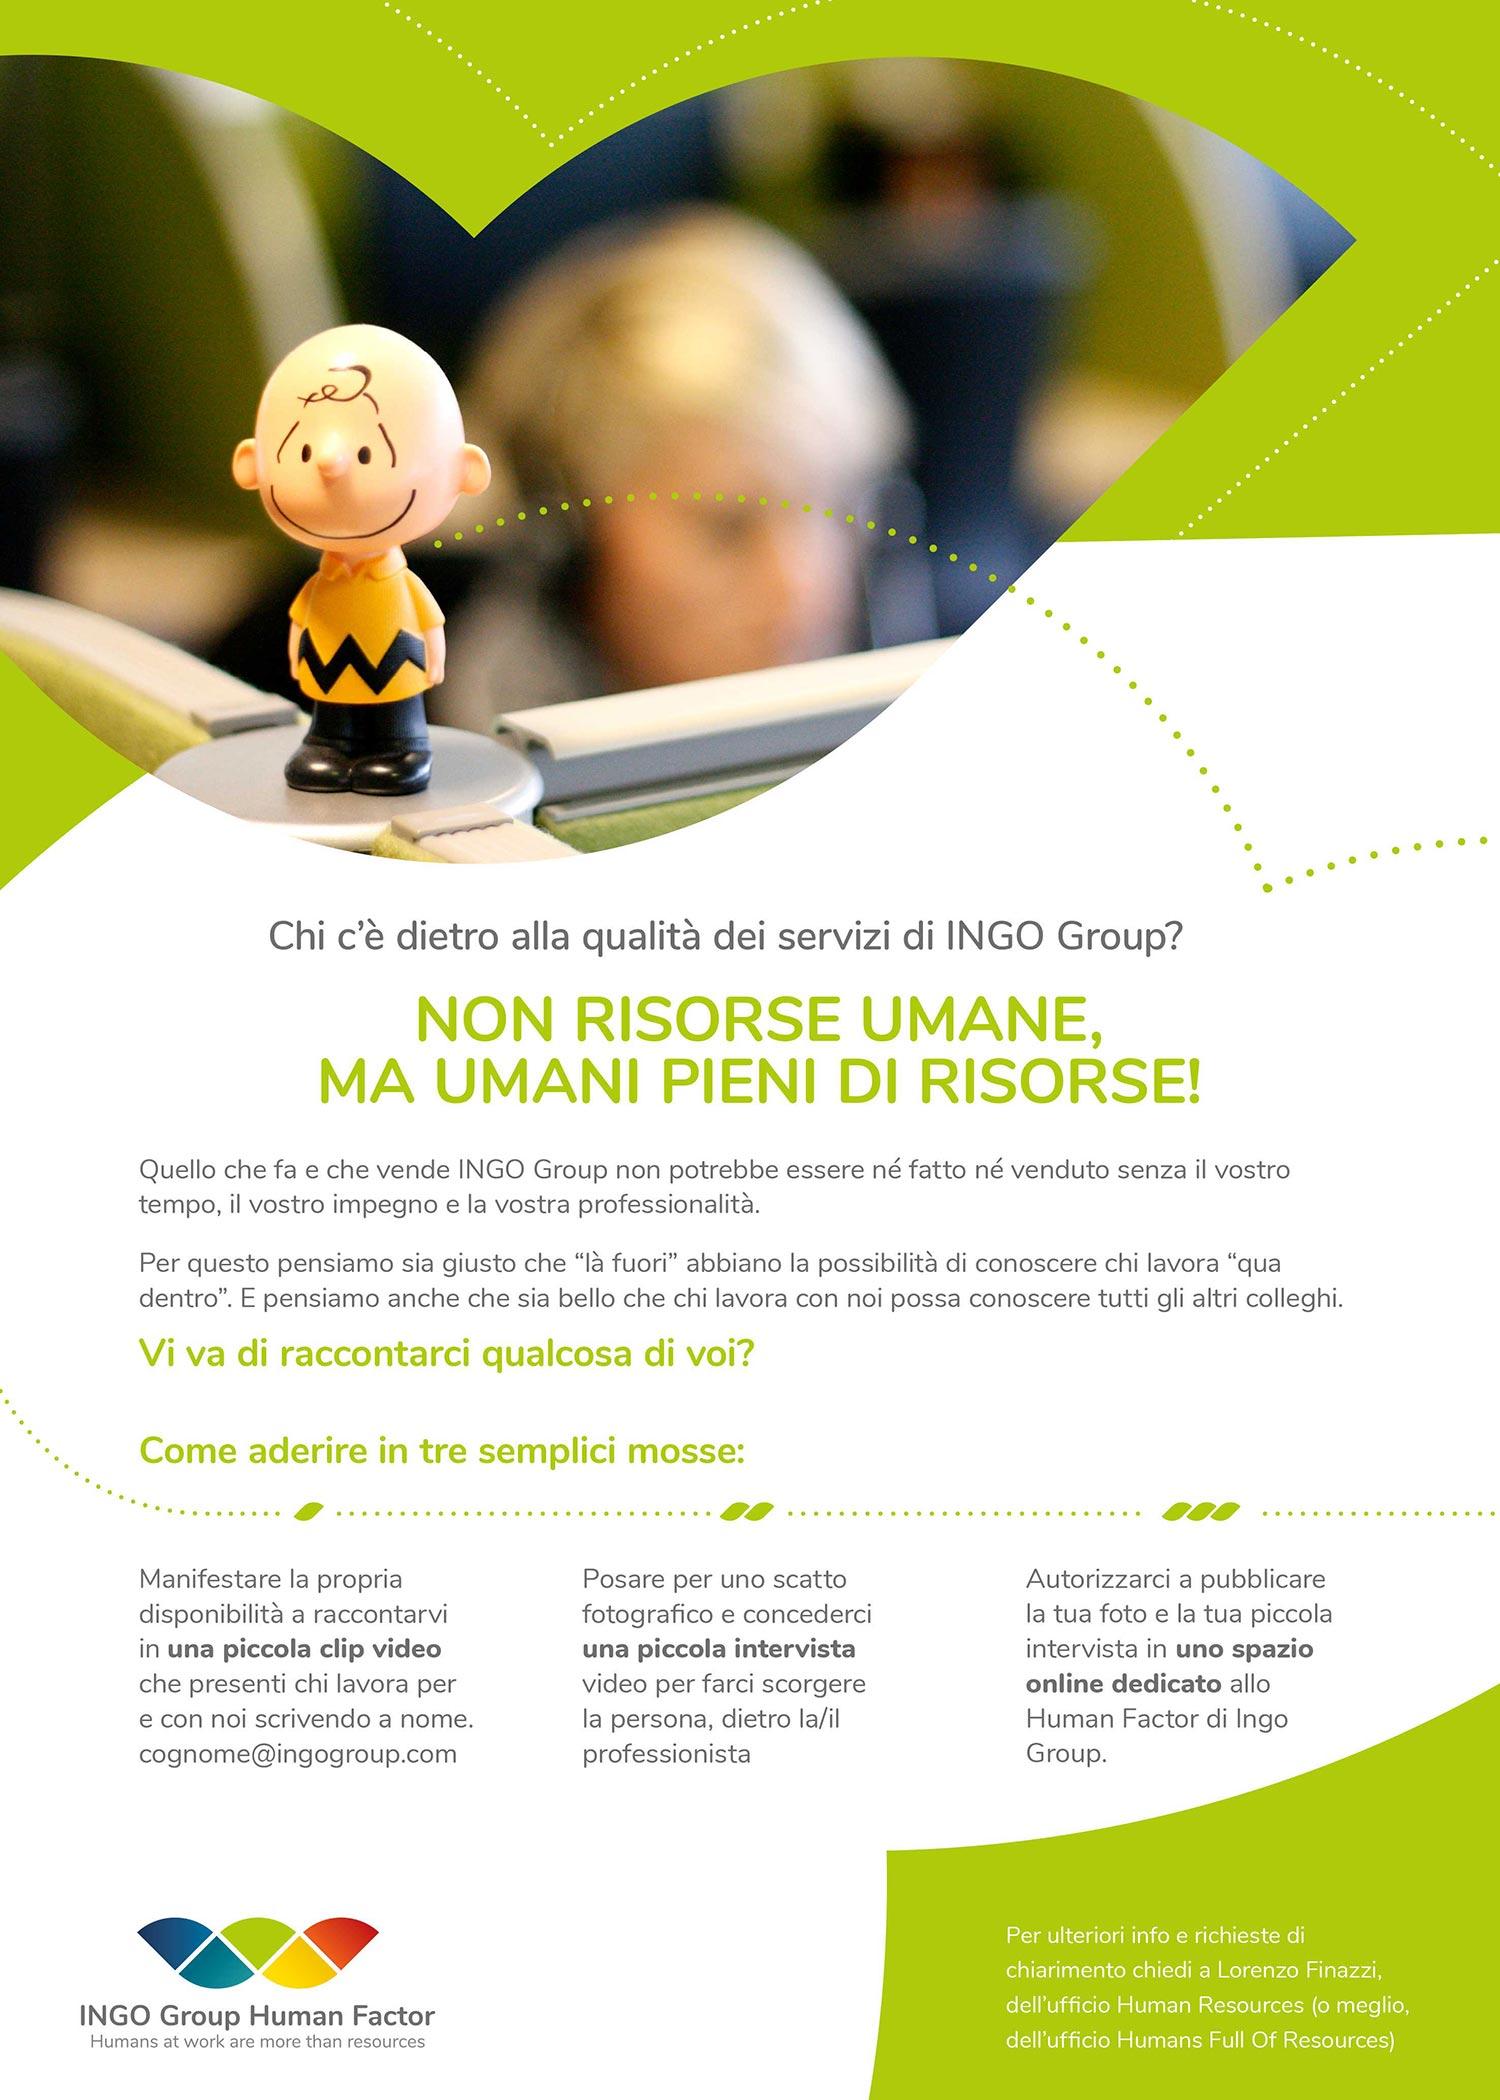 INGO_Campagna-adesioni_phonetica